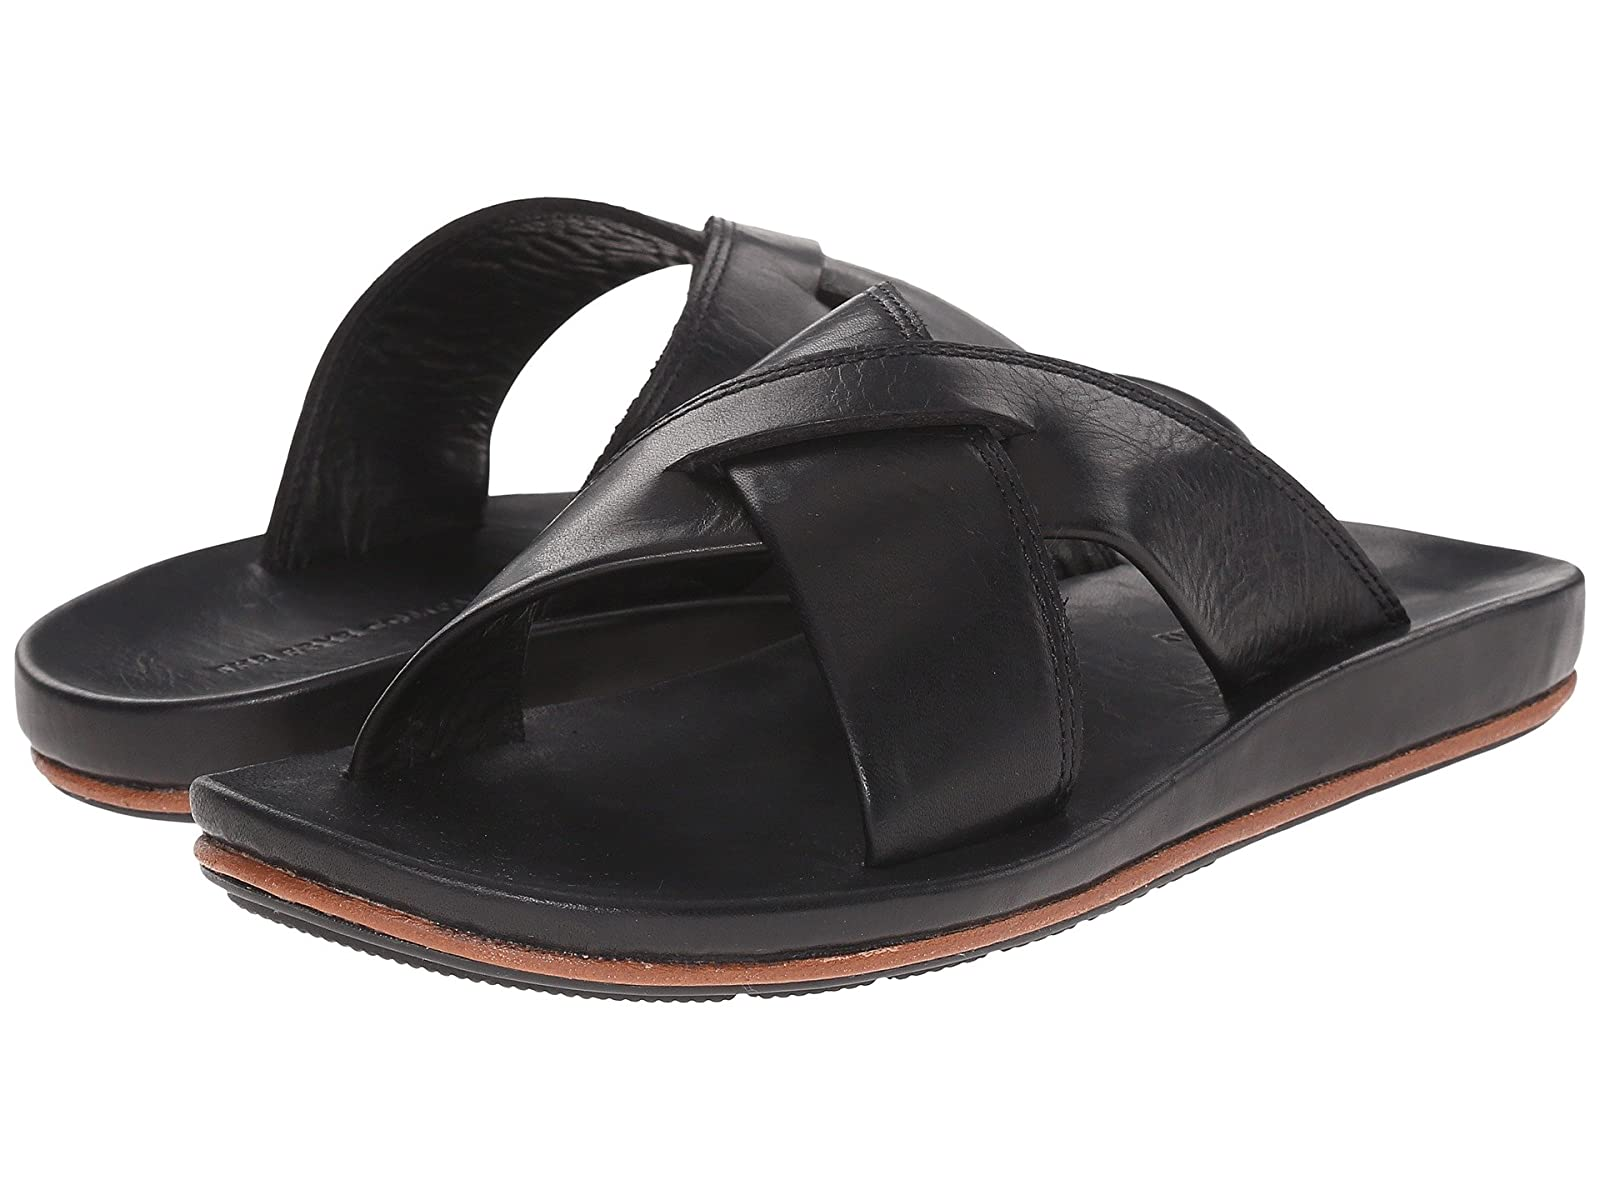 Frye Brent Cross StrapCheap and distinctive eye-catching shoes